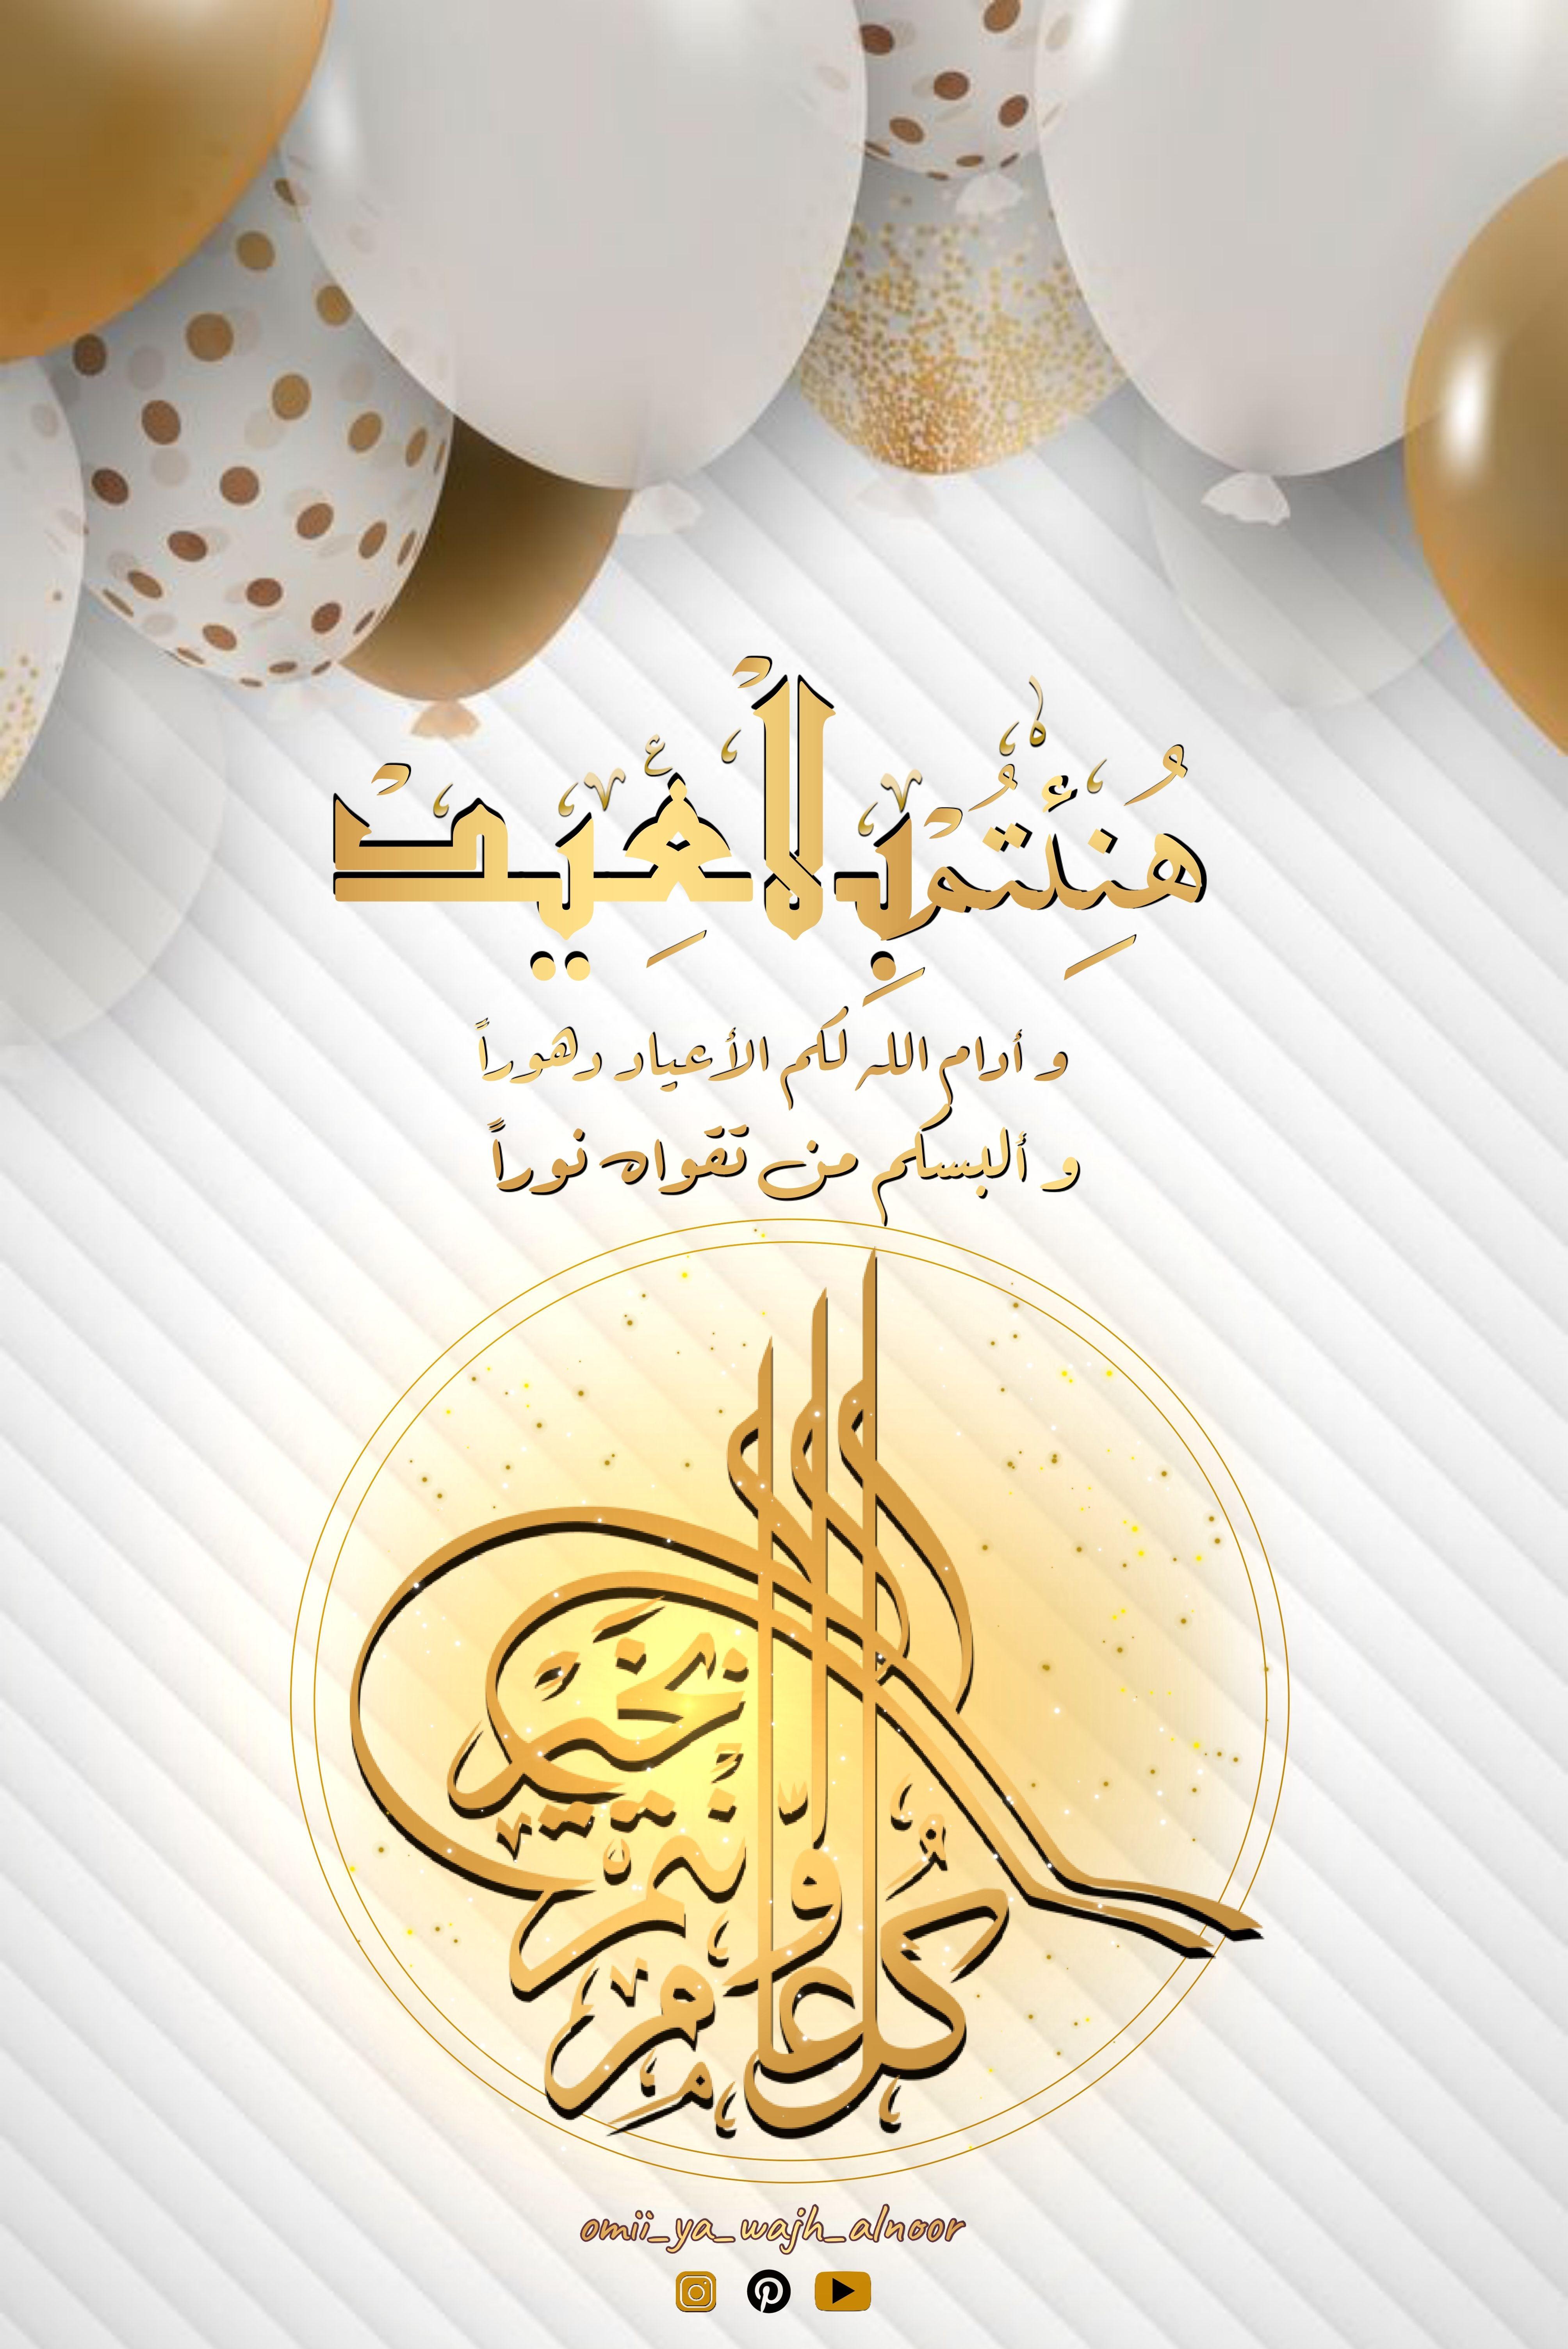 عيدكم مبارك وعساكم من عواده Eid Mubarak Greetings Eid Greetings Eid Mubark